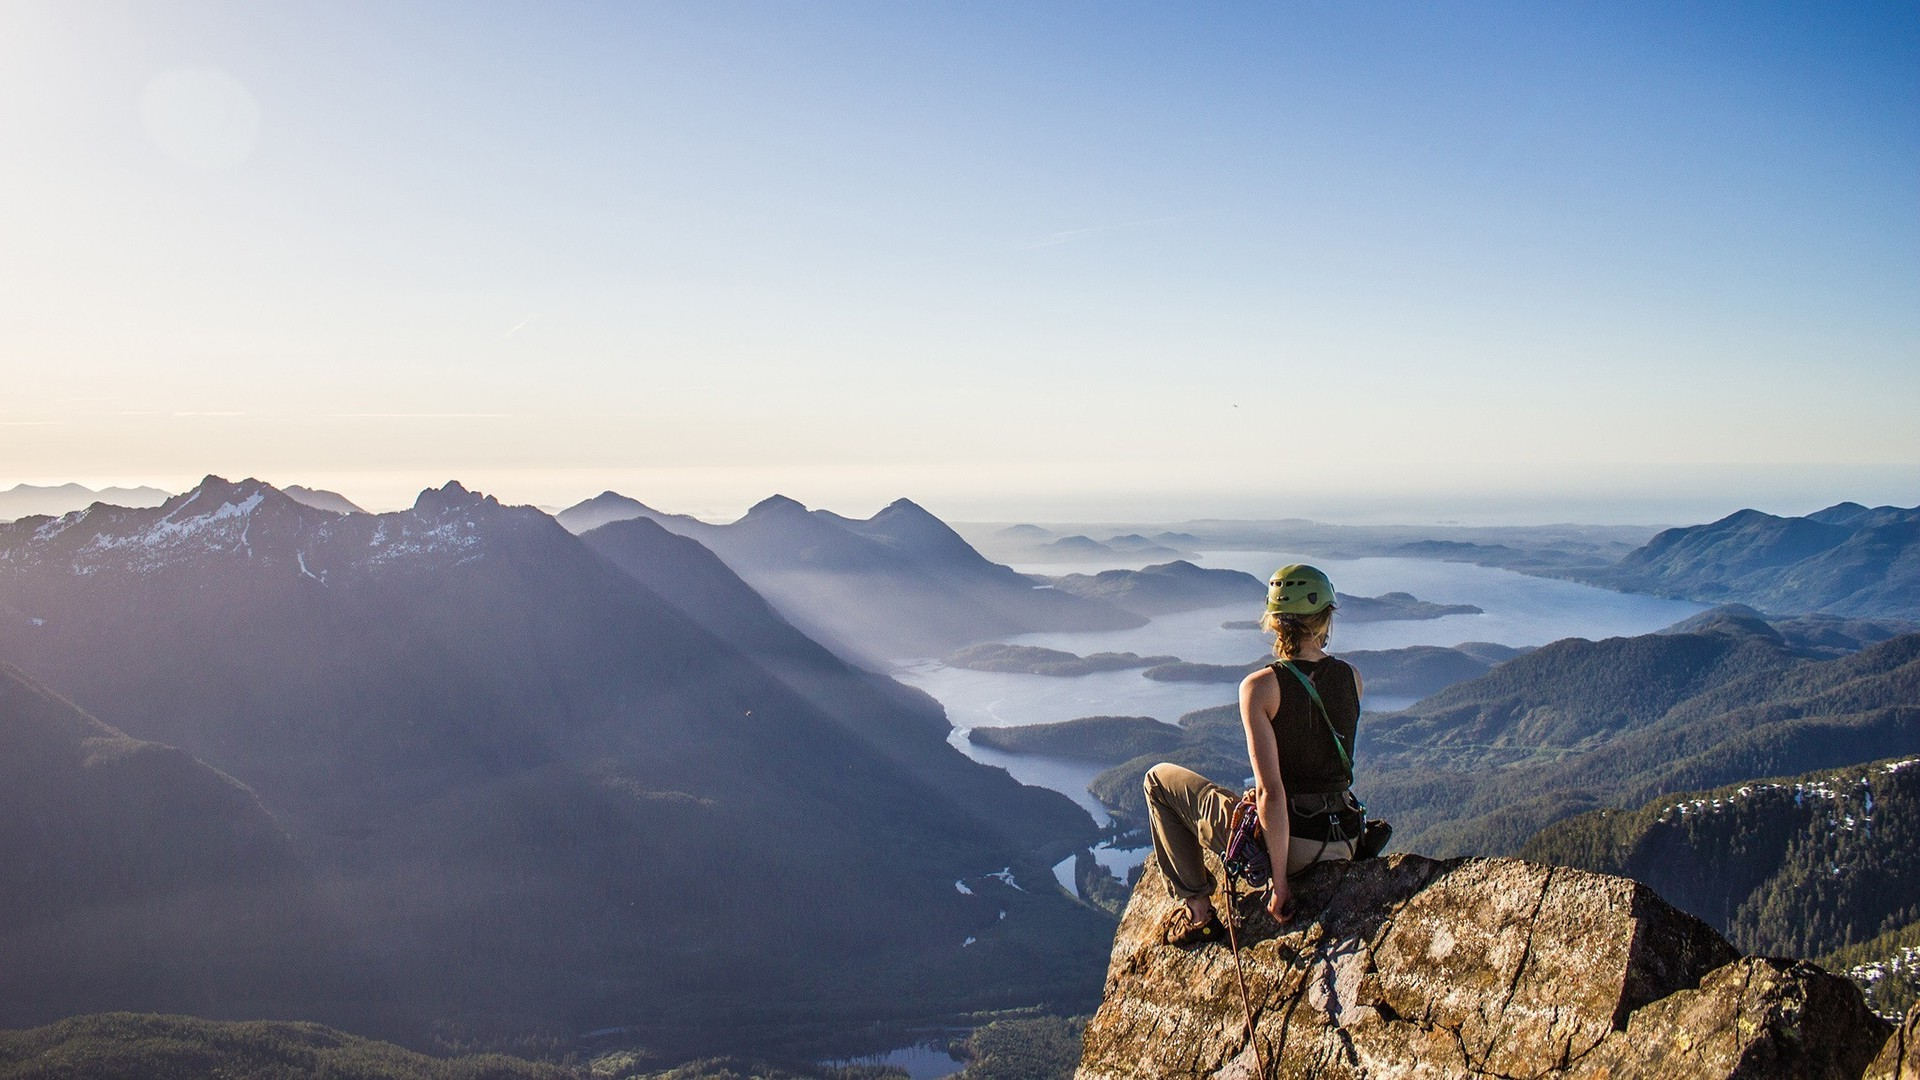 153615-landscape-nature-women-rock_climbing-lake-mountain-rock-sunlight-horizon.jpg